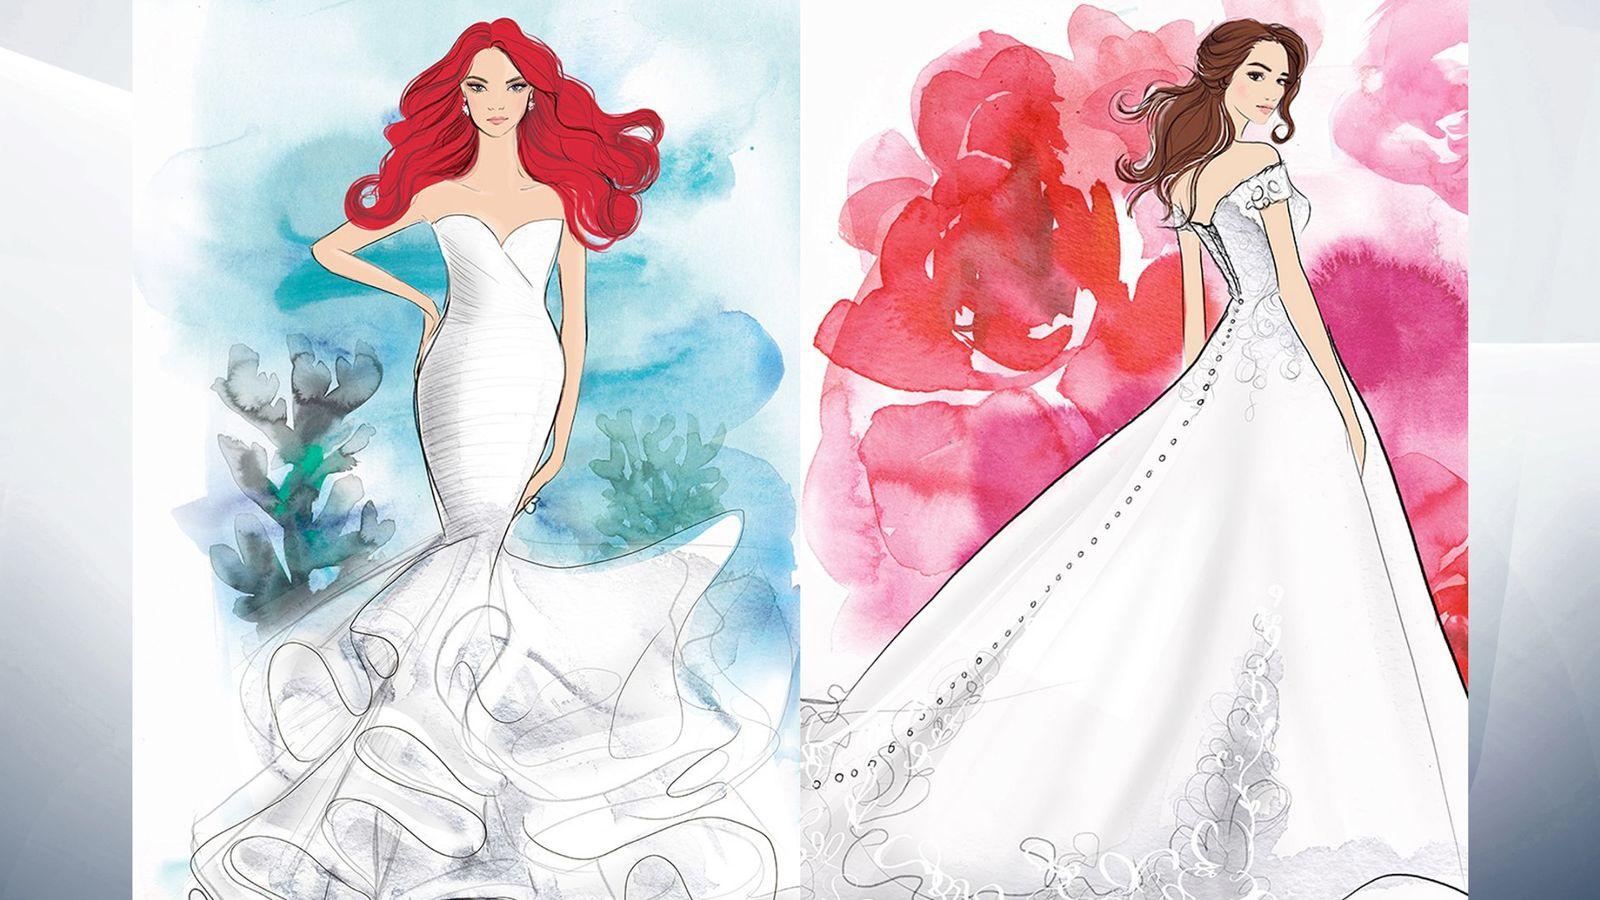 Disney launches wedding dress range replicating iconic princesses